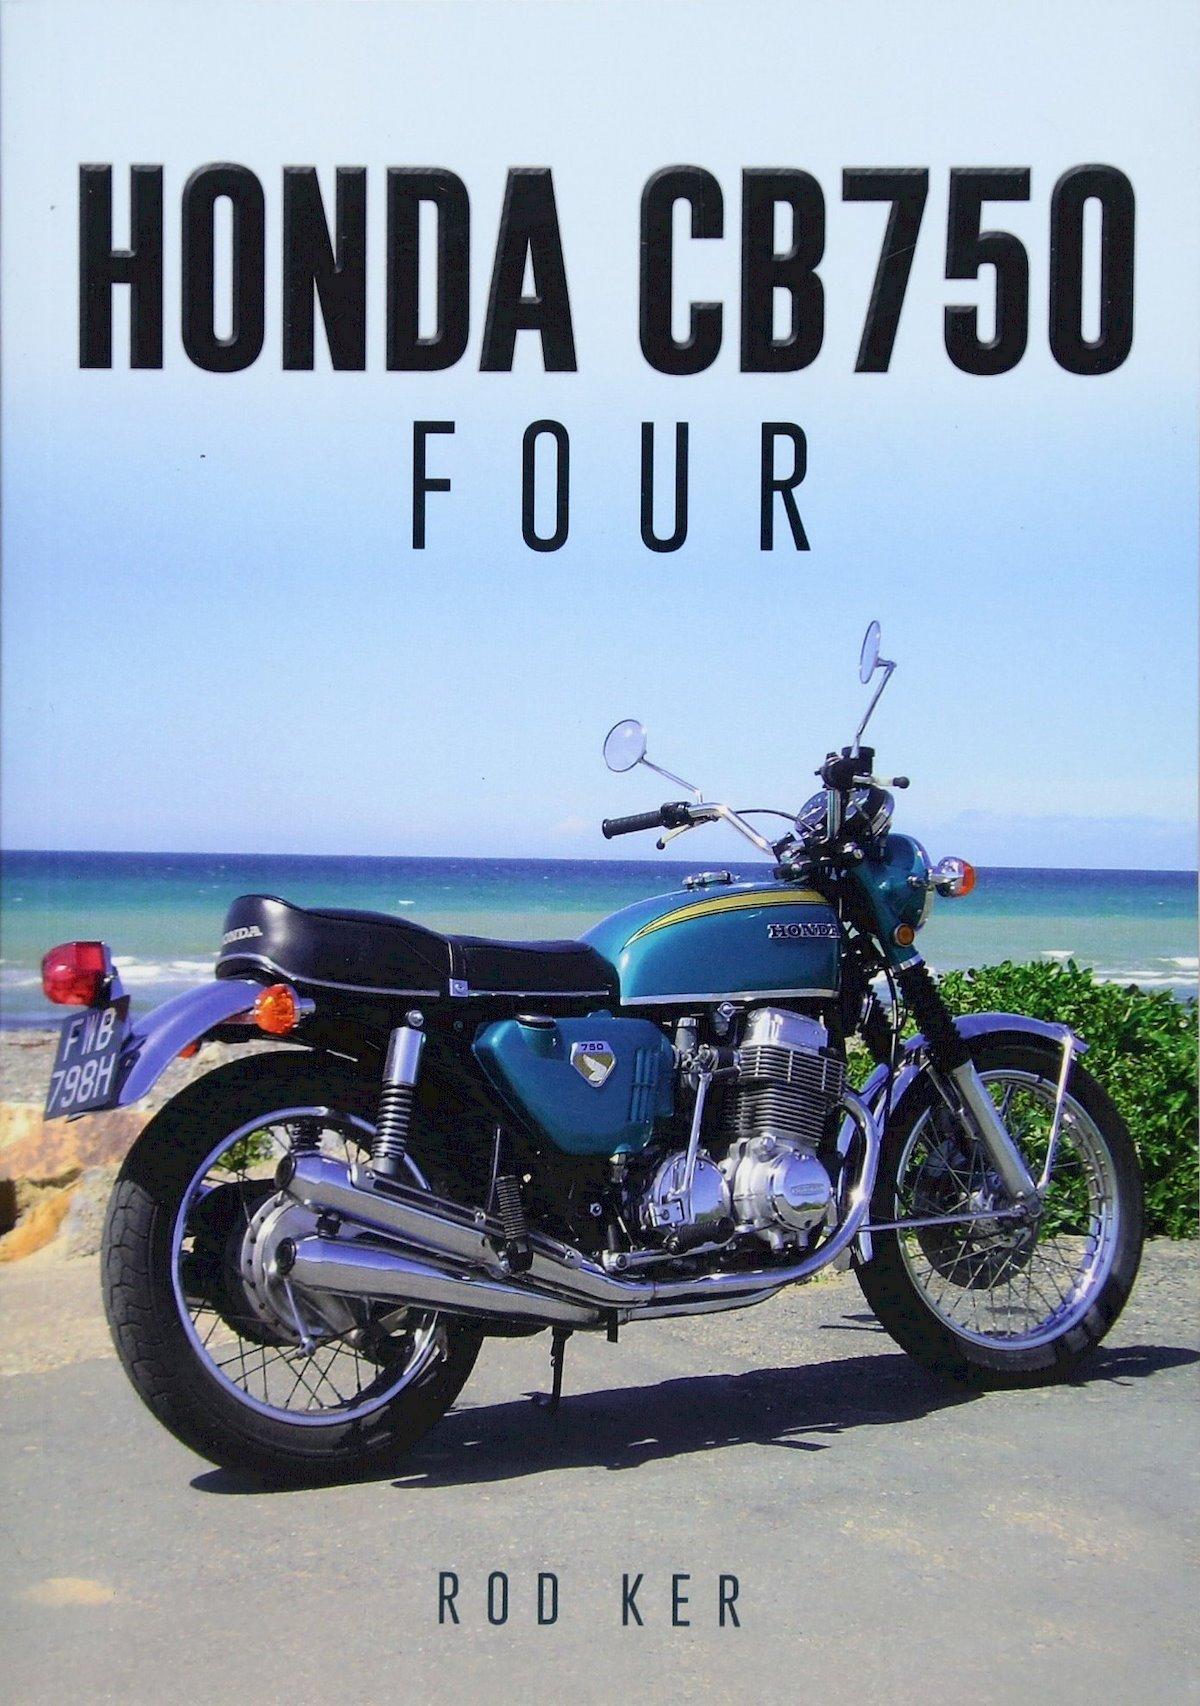 Image of HONDA CB 750